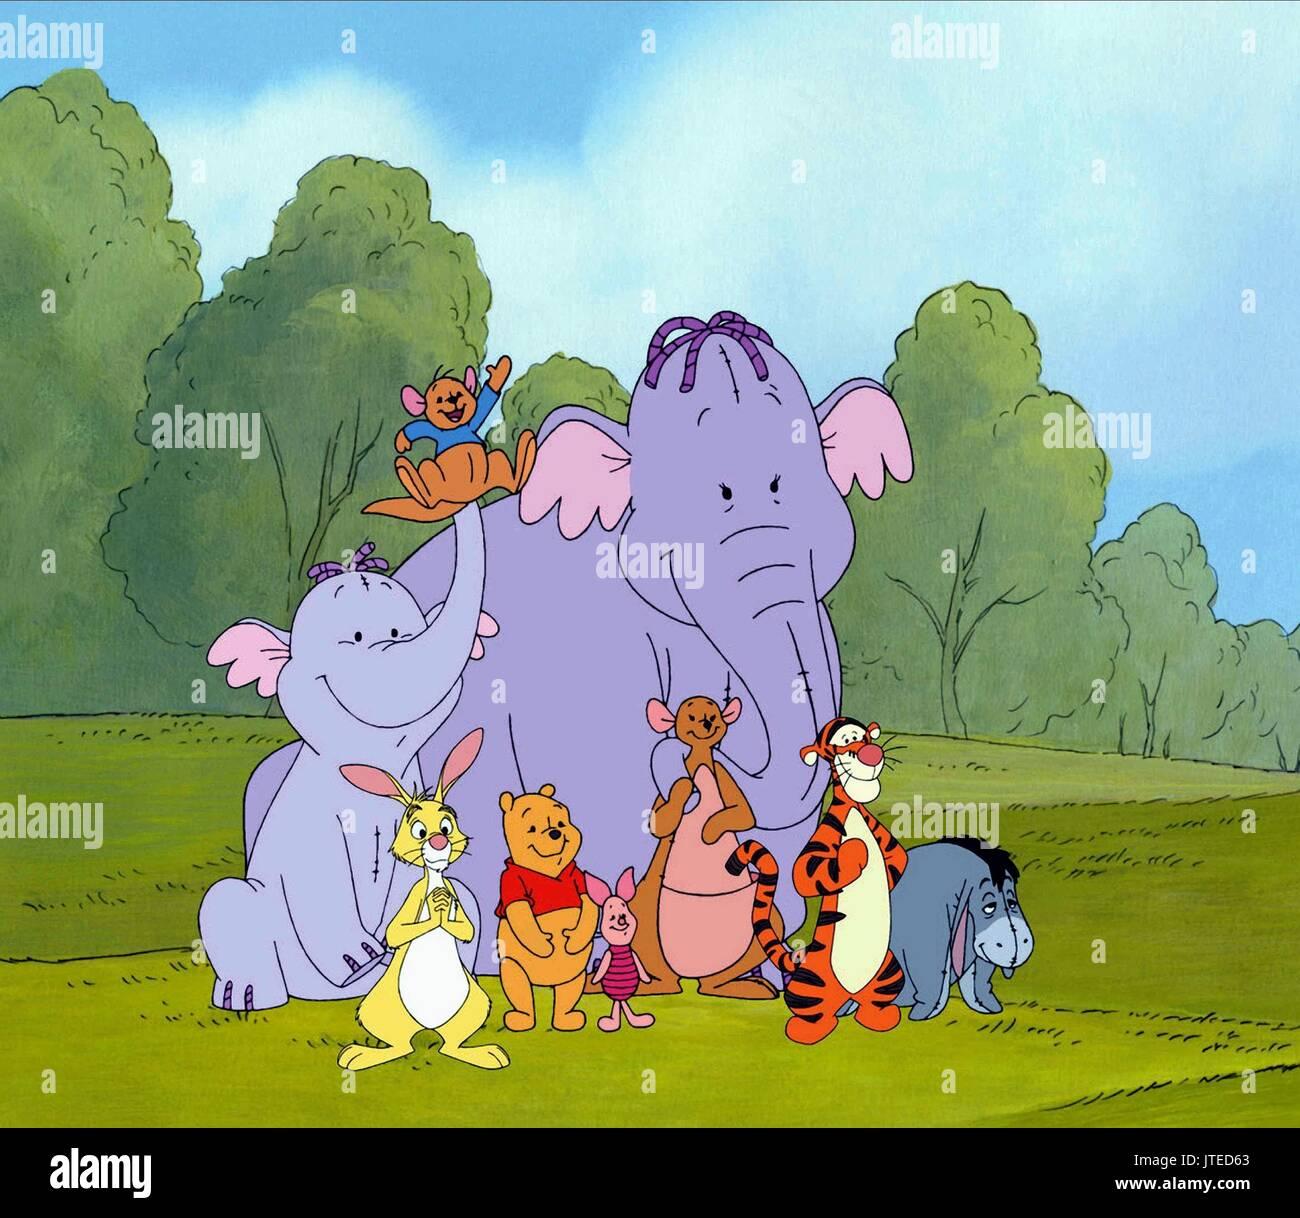 Uncategorized Winnie The Pooh Lumpy lumpy roo rabbit winnie the pooh mama heffalump piglet kanga tigger eeyore poohs movie 2005